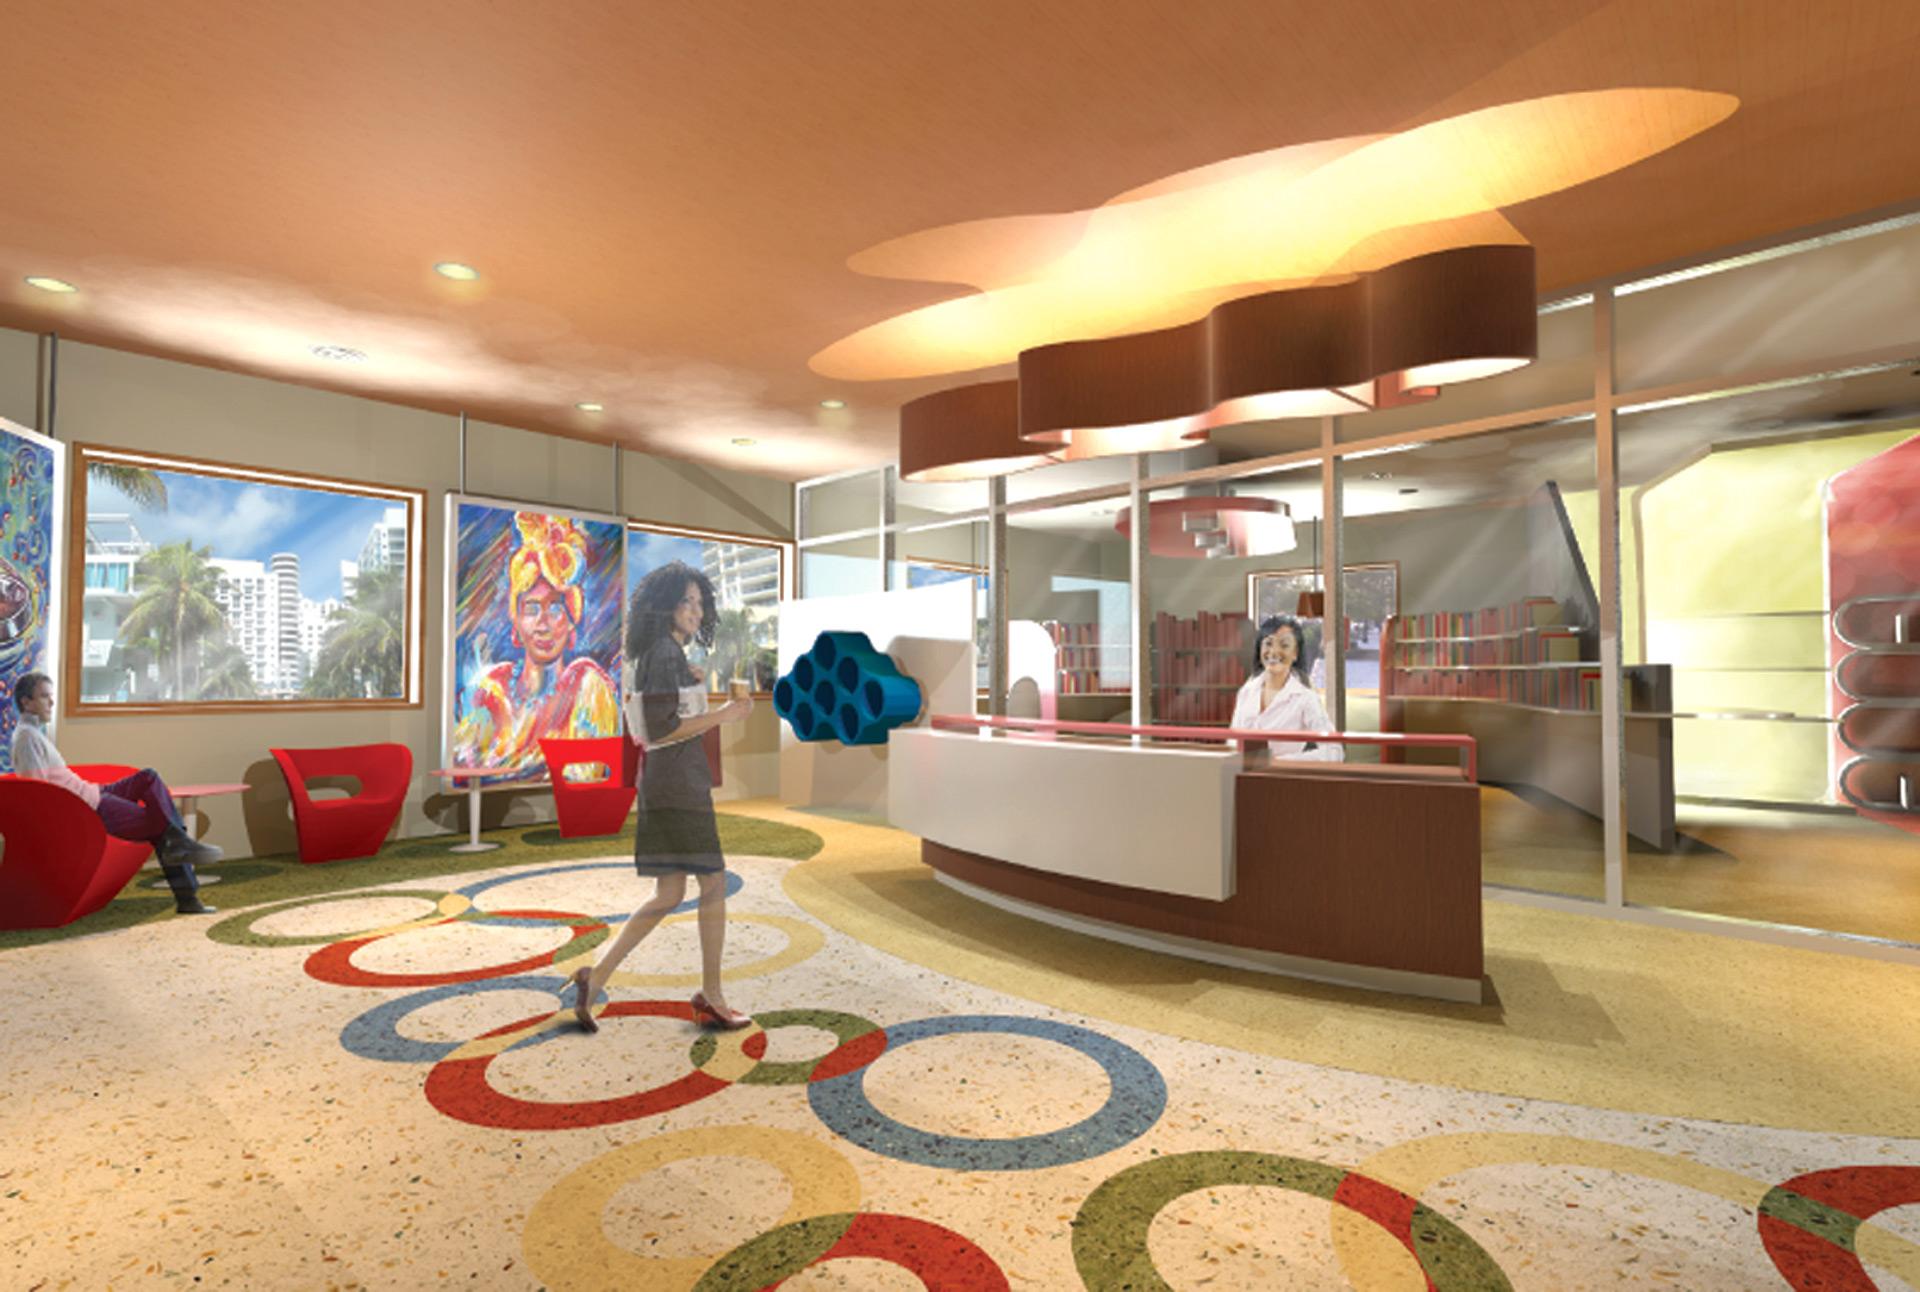 Iida Honoree Promotes Cultural Understanding With Design